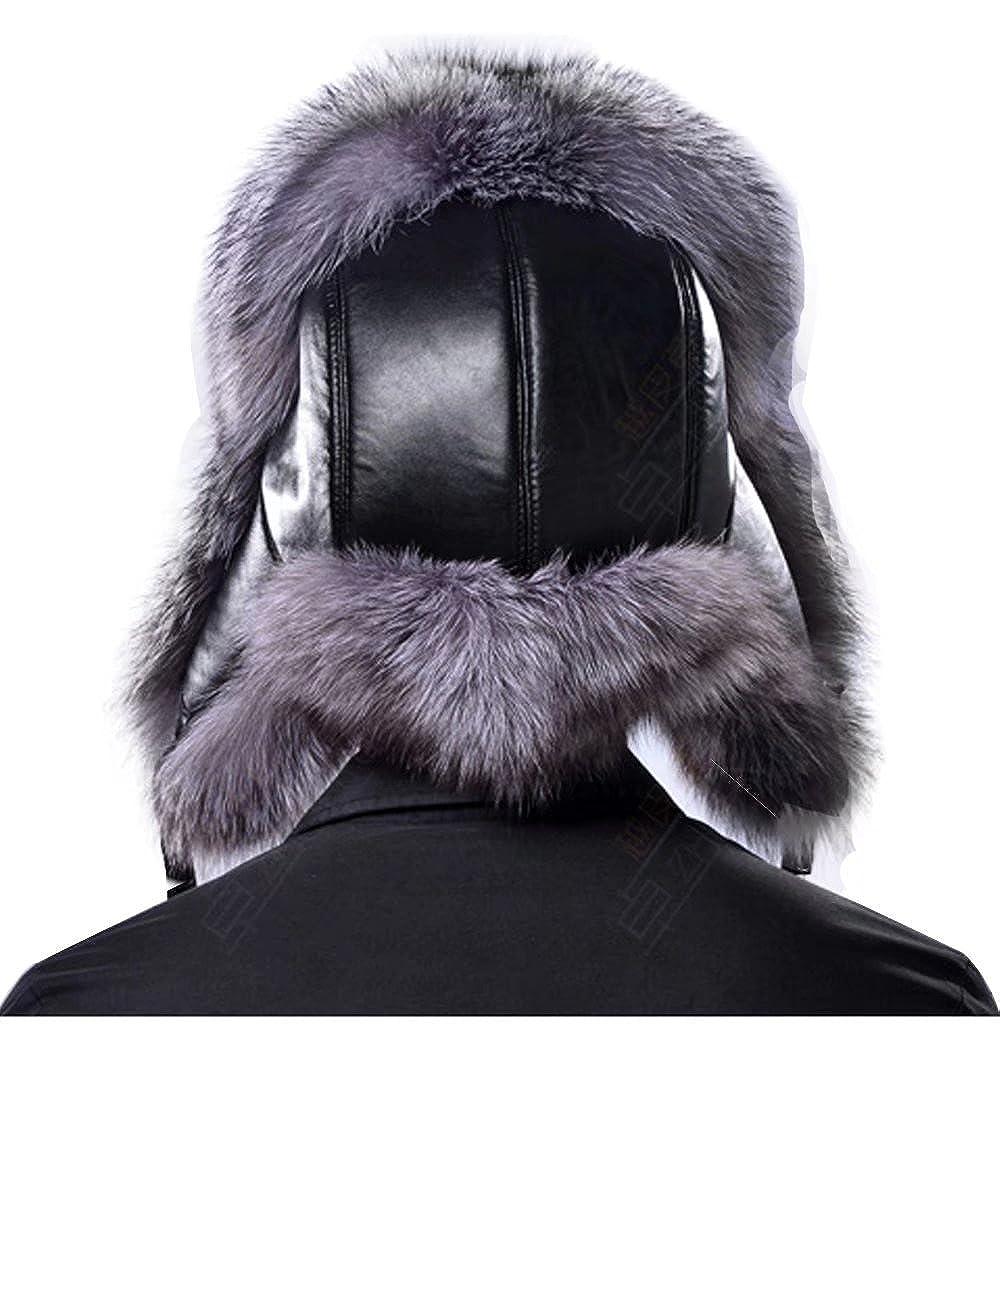 Bettomo HAT メンズ  Blue(56-62cm) B0756ZG9JQ